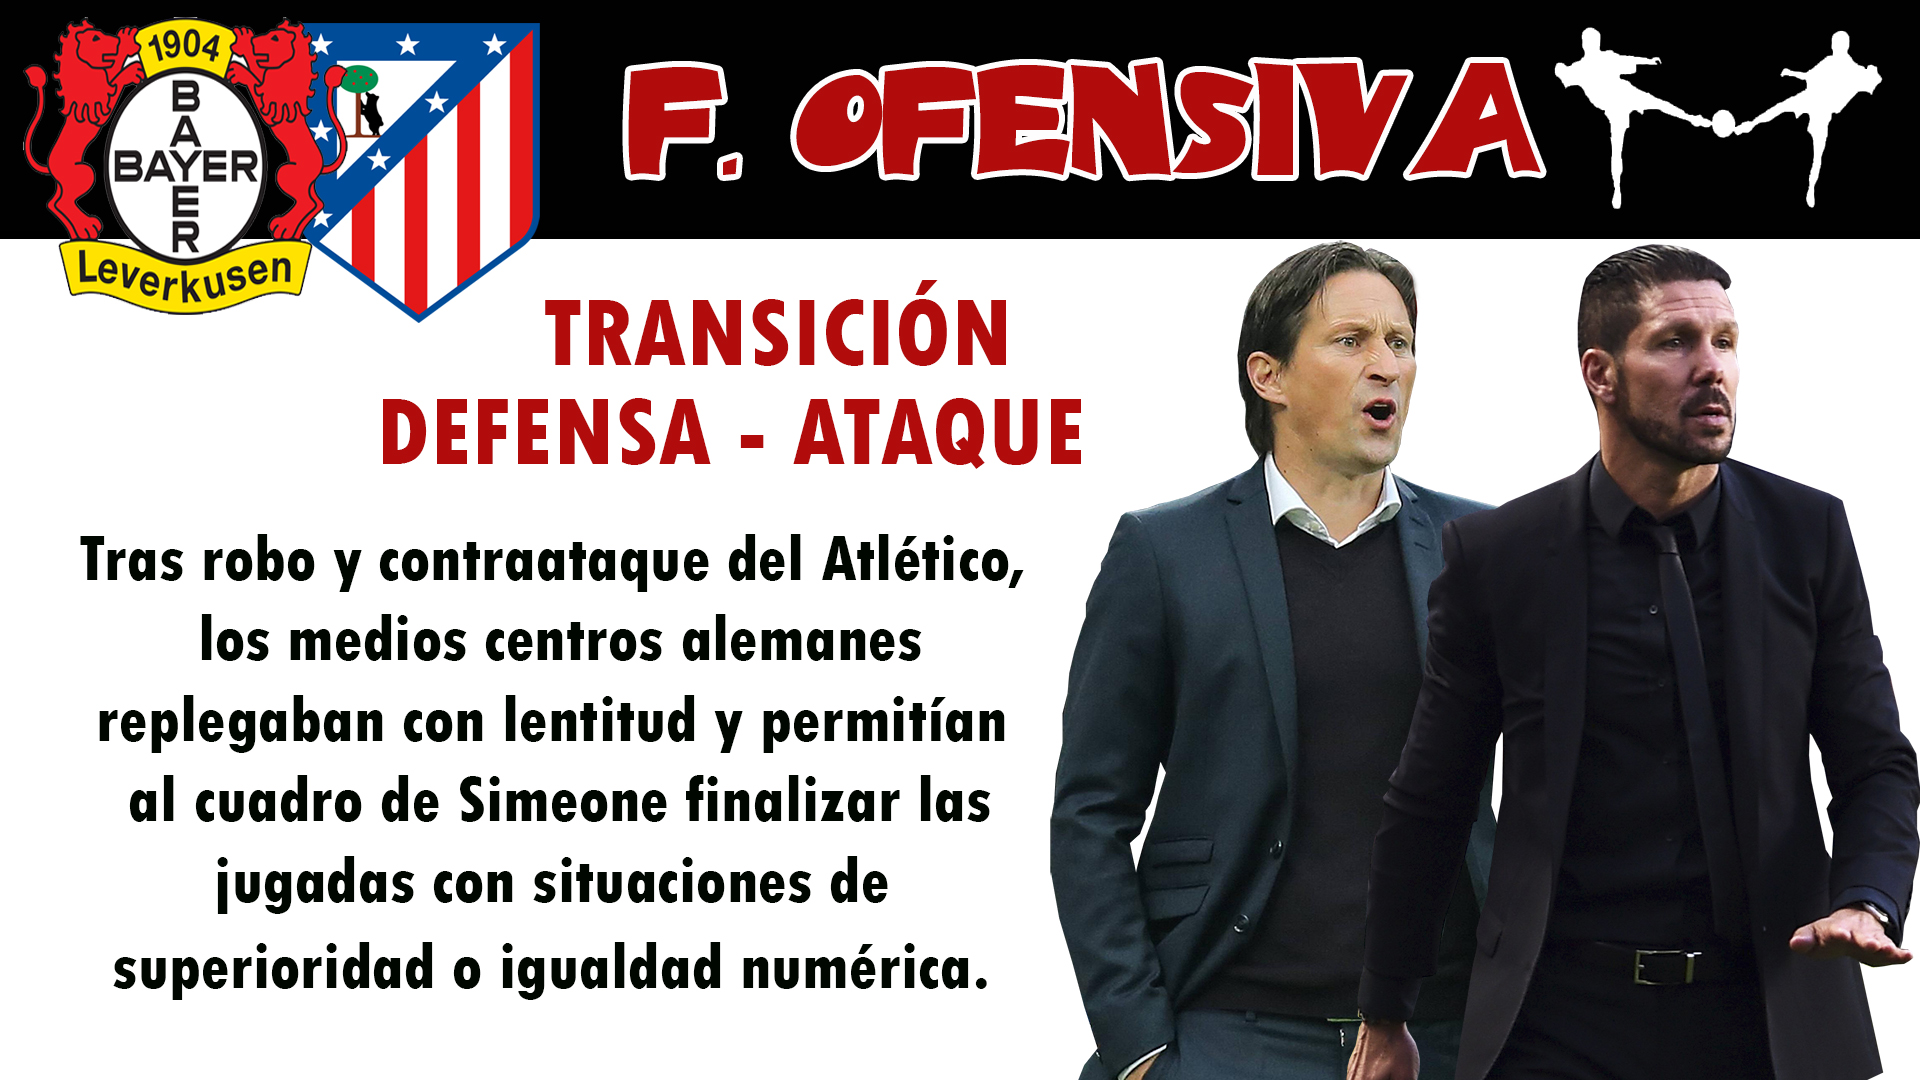 futbolcarrasco champions league entrenador leverkusen atletico madrid simeone